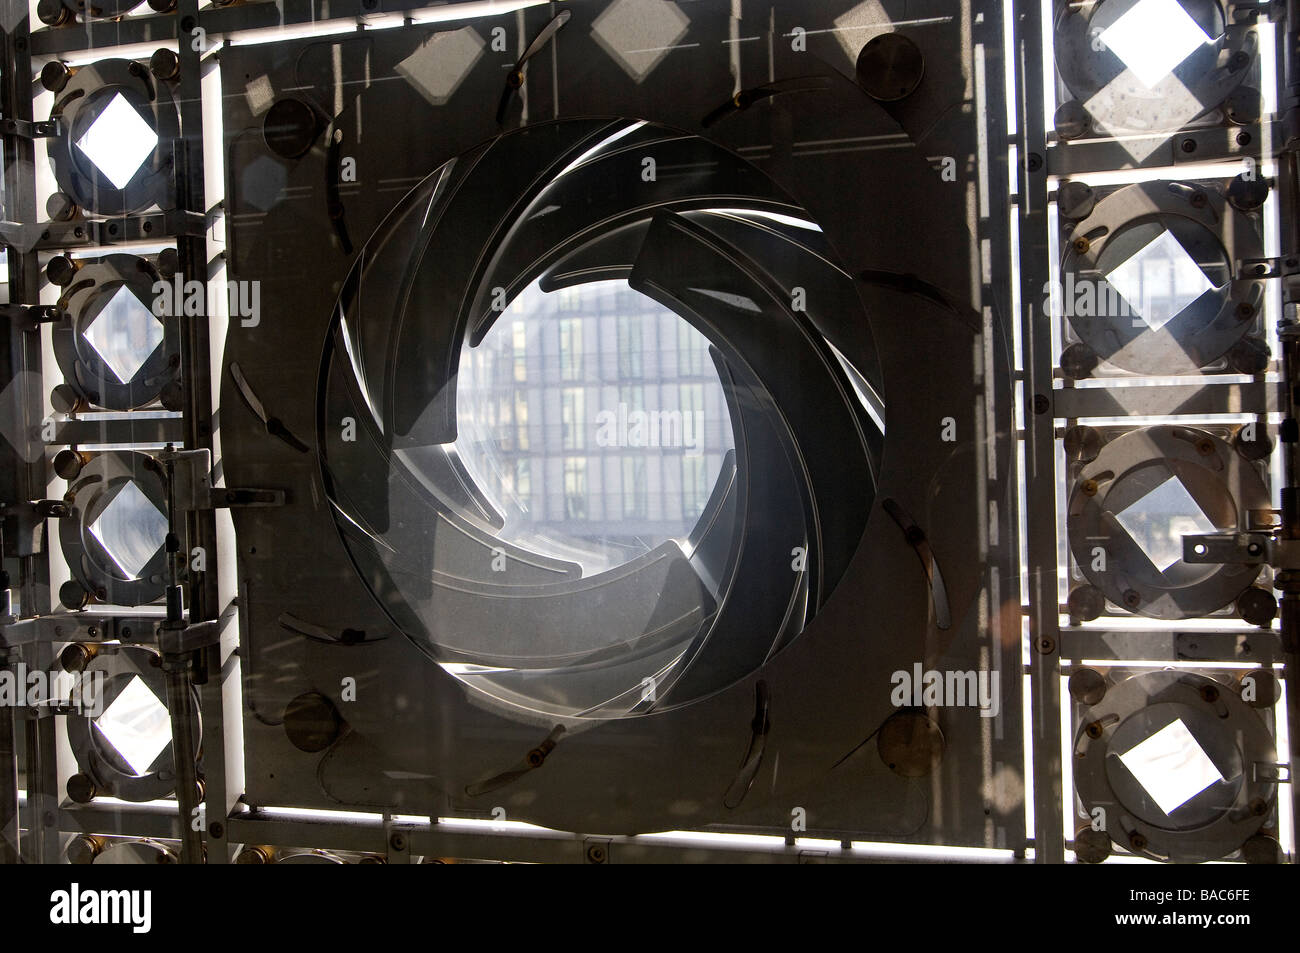 france  paris  institut du monde arabe  arab world institute  by stock photo  royalty free image